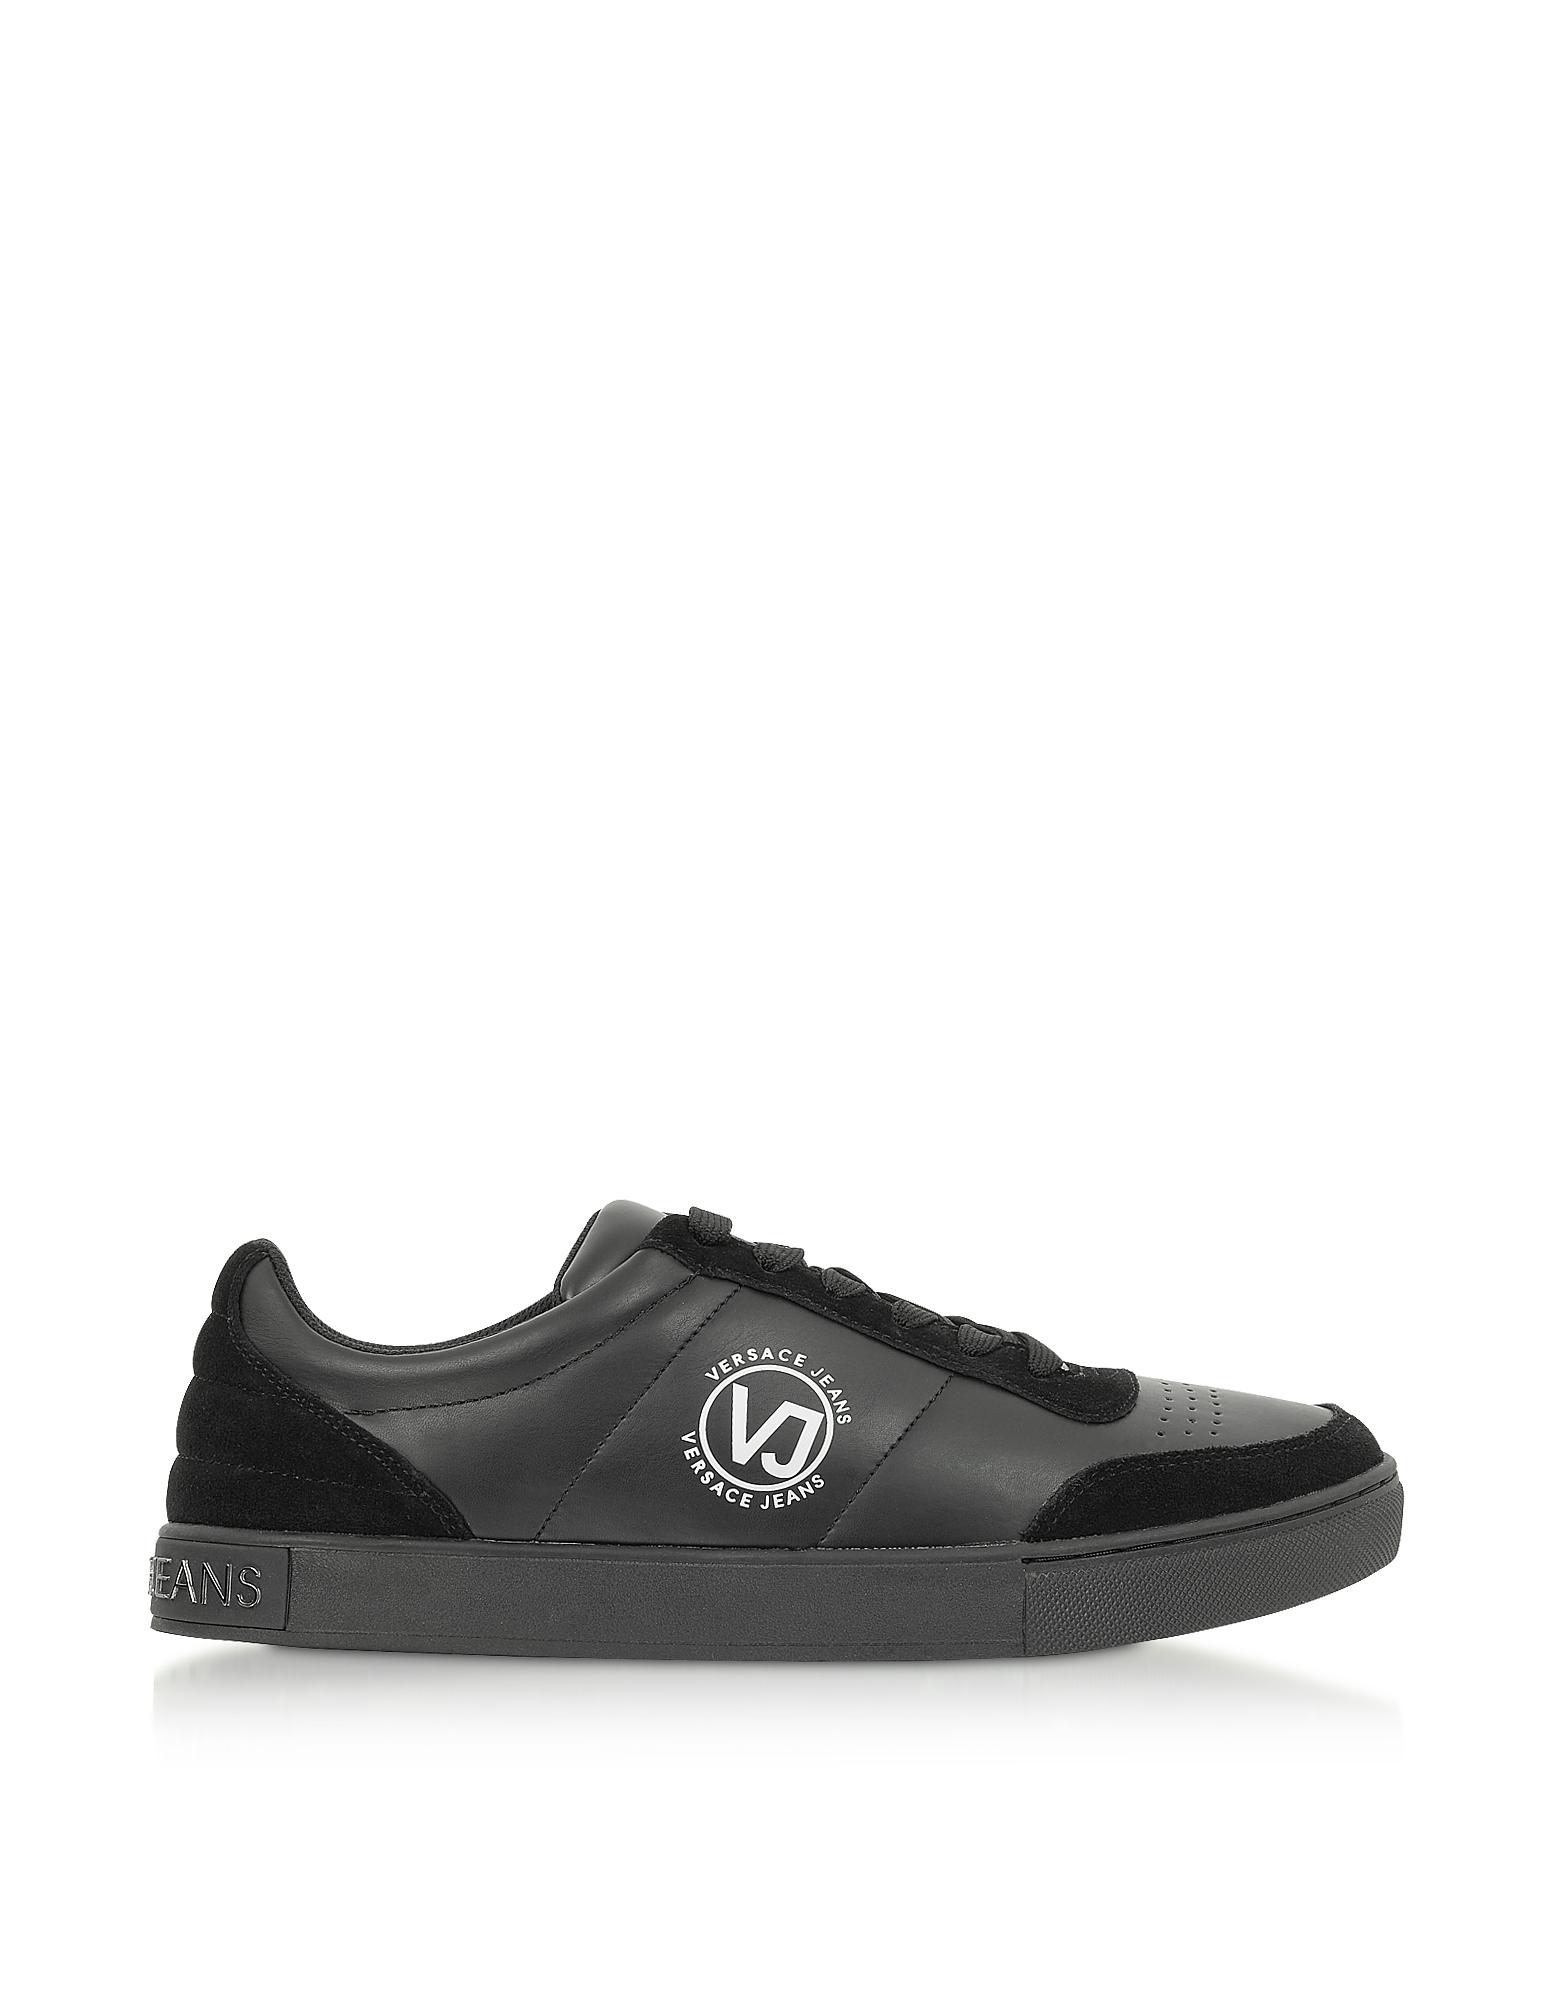 Versace Jeans Designer Shoes, Black Leather & Suede Signture Men's Sneakers